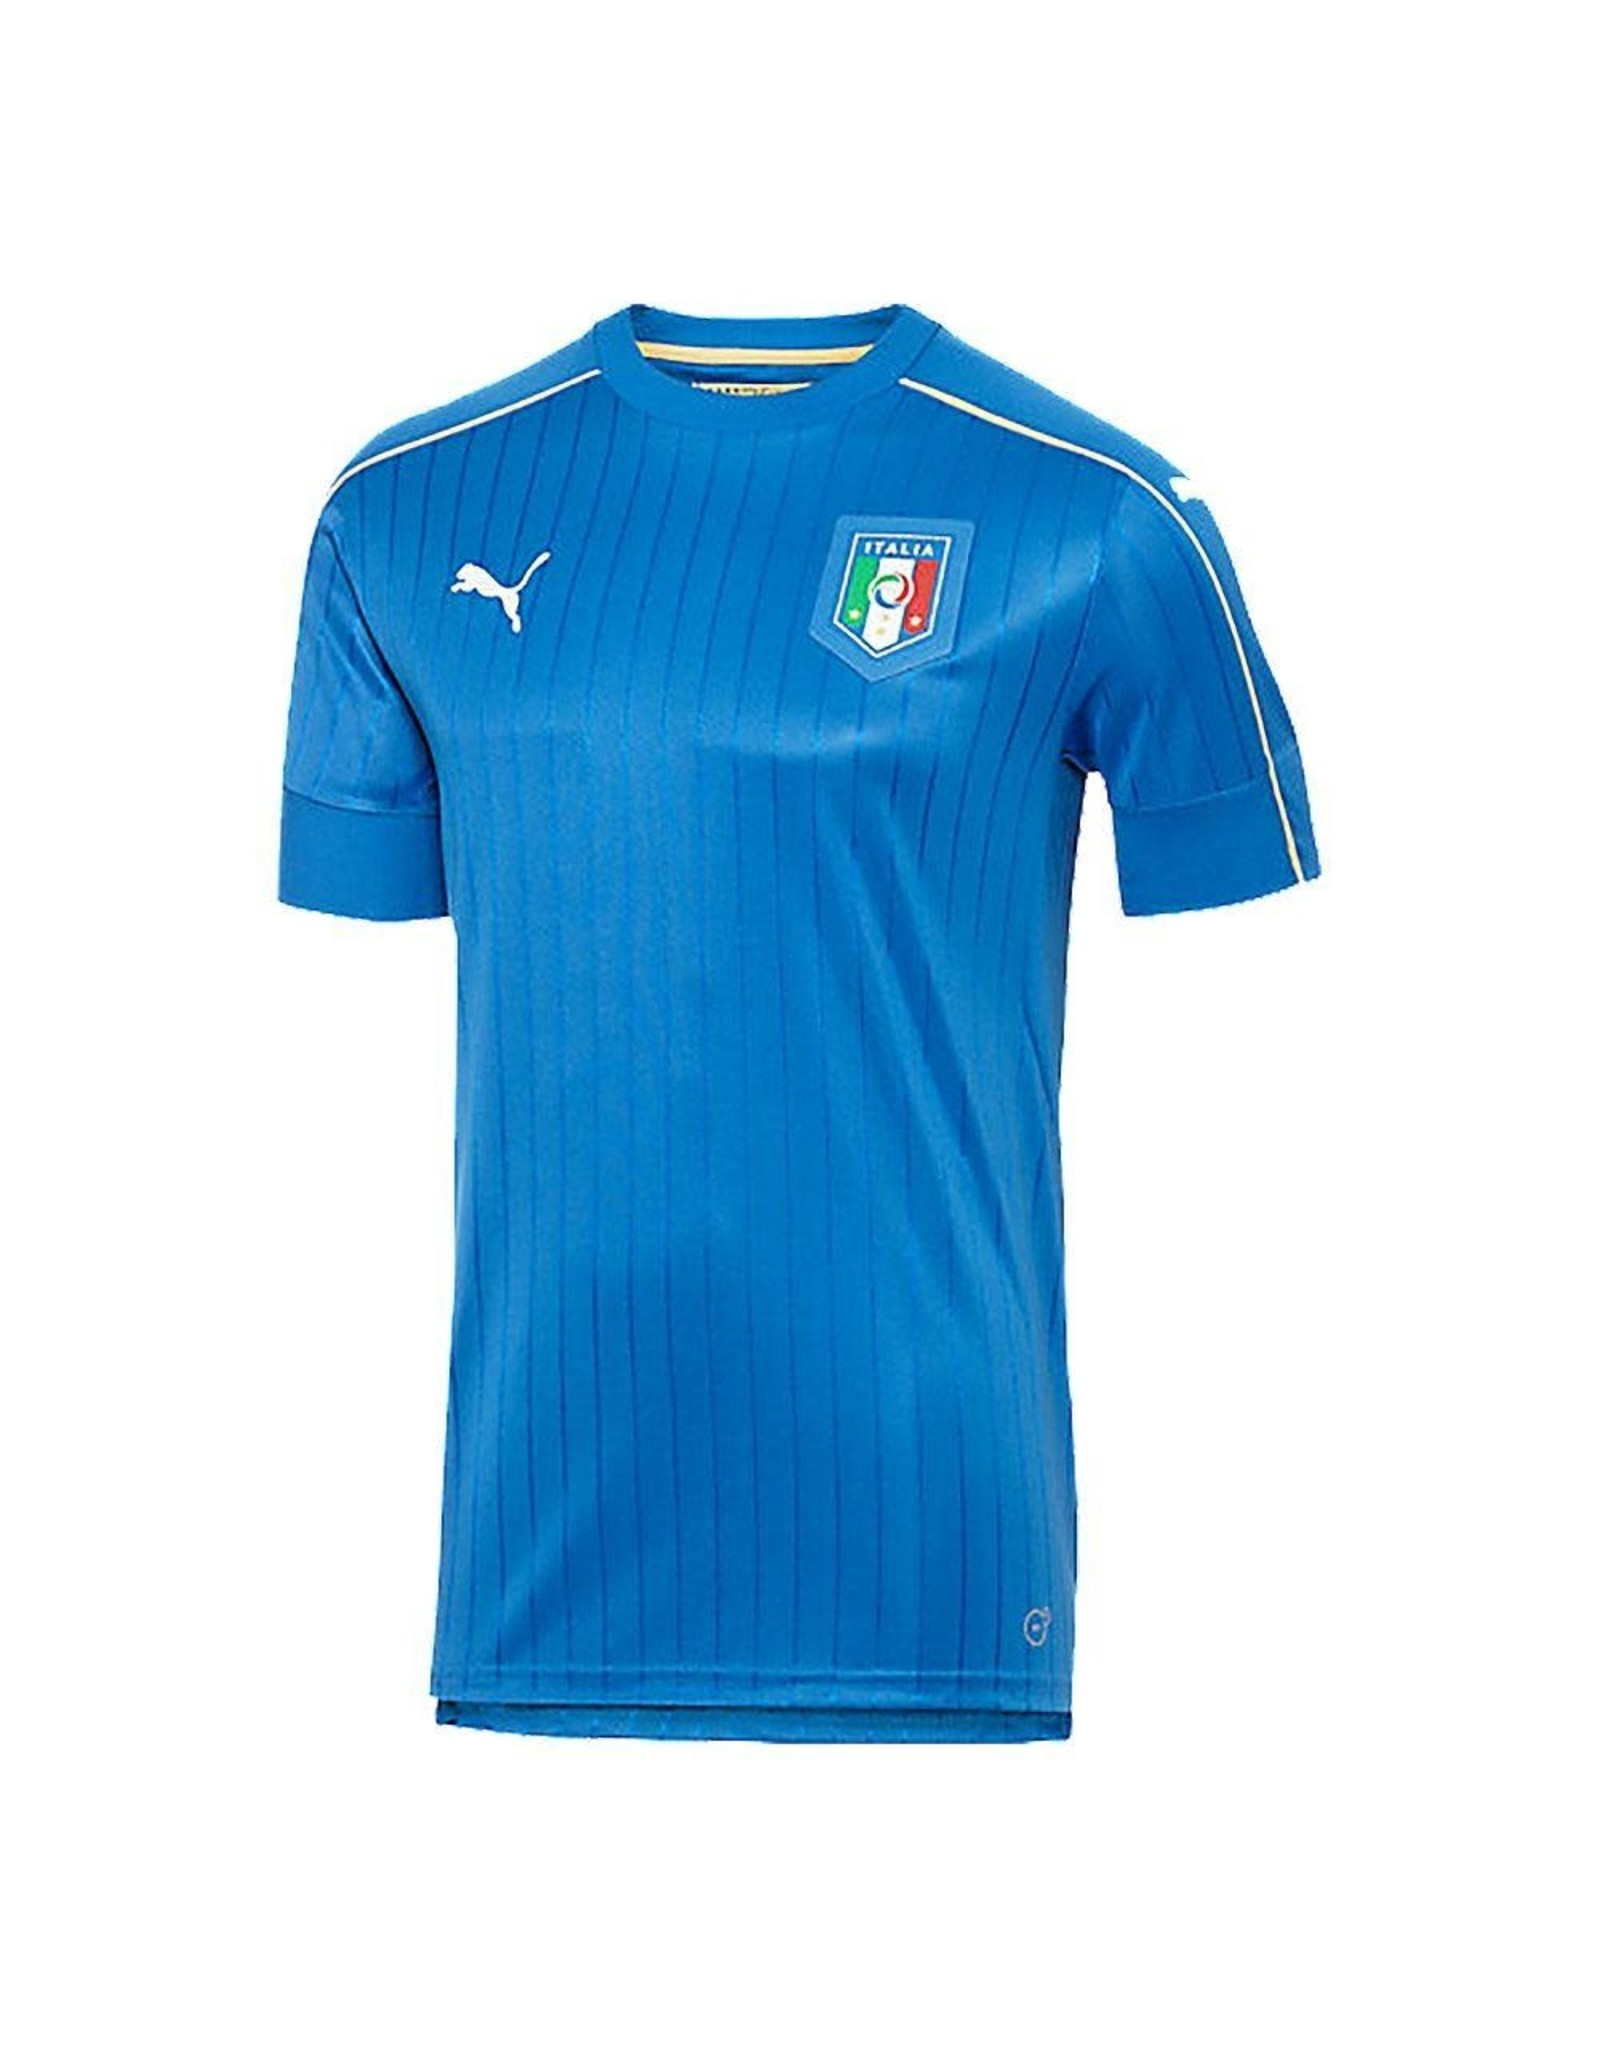 Puma Puma Men's Italia Home Replica Jersey